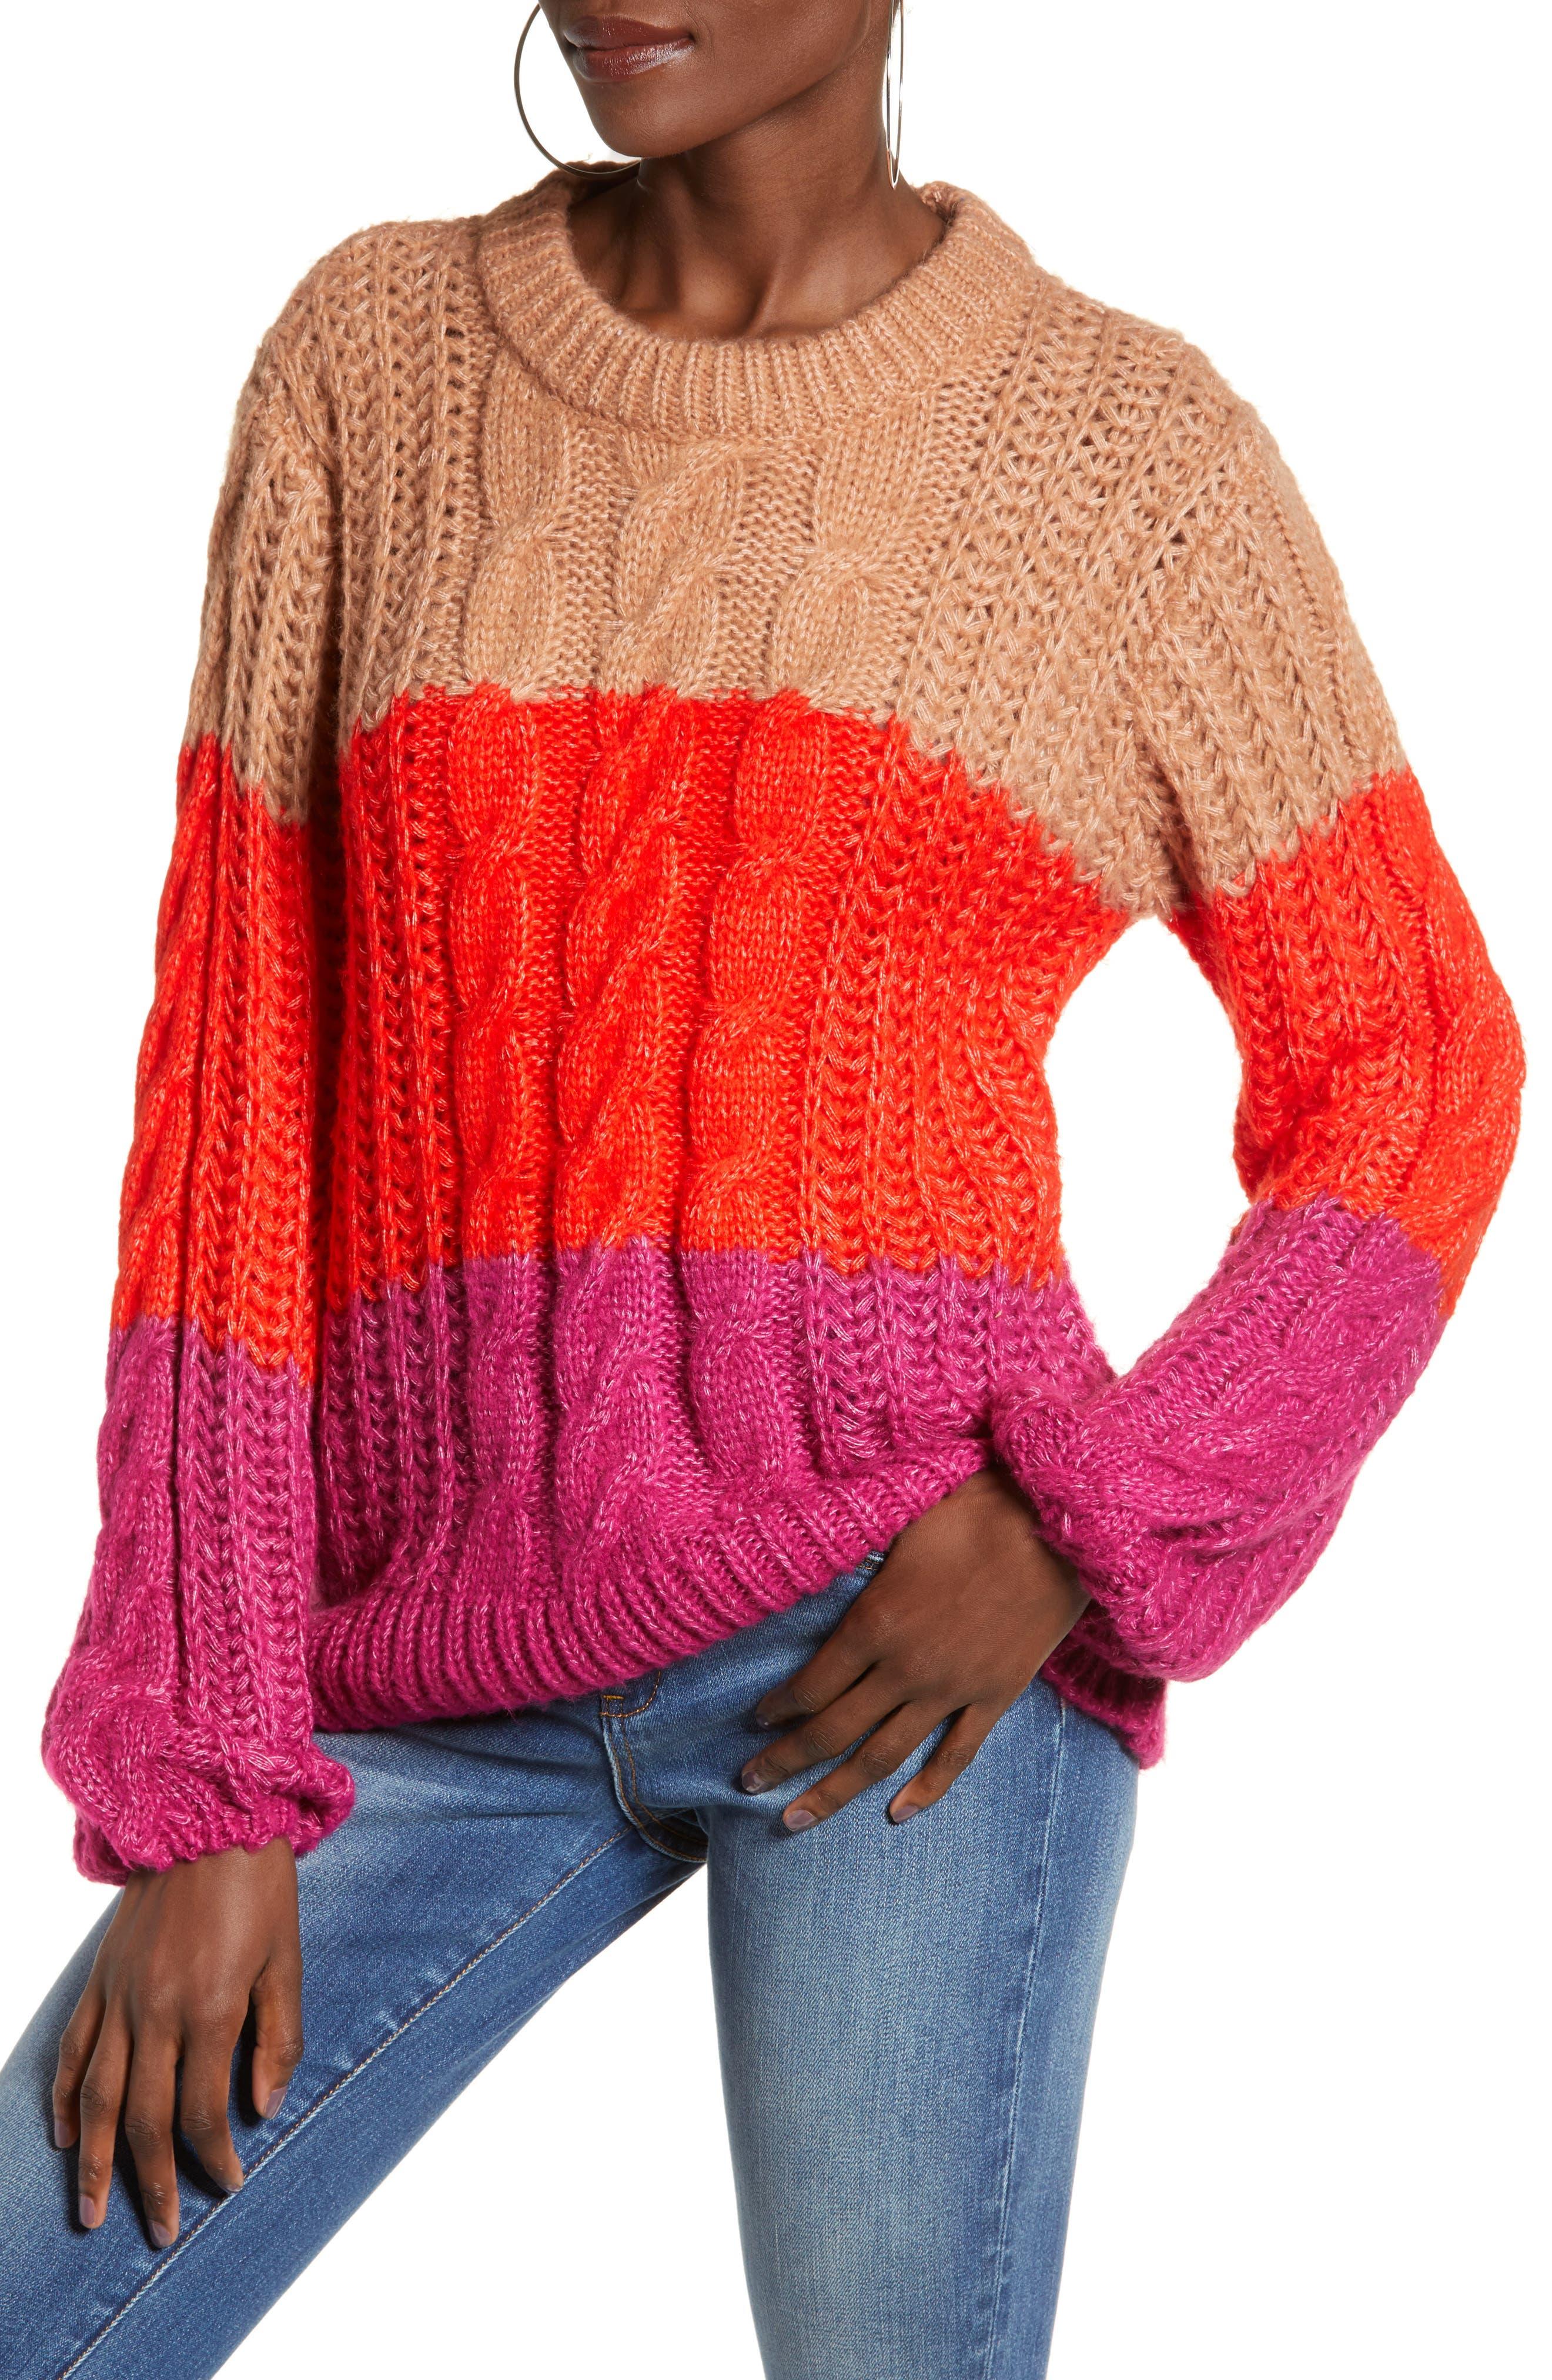 Vero Moda Becca Colorblock Chunky Cable Sweater, Brown